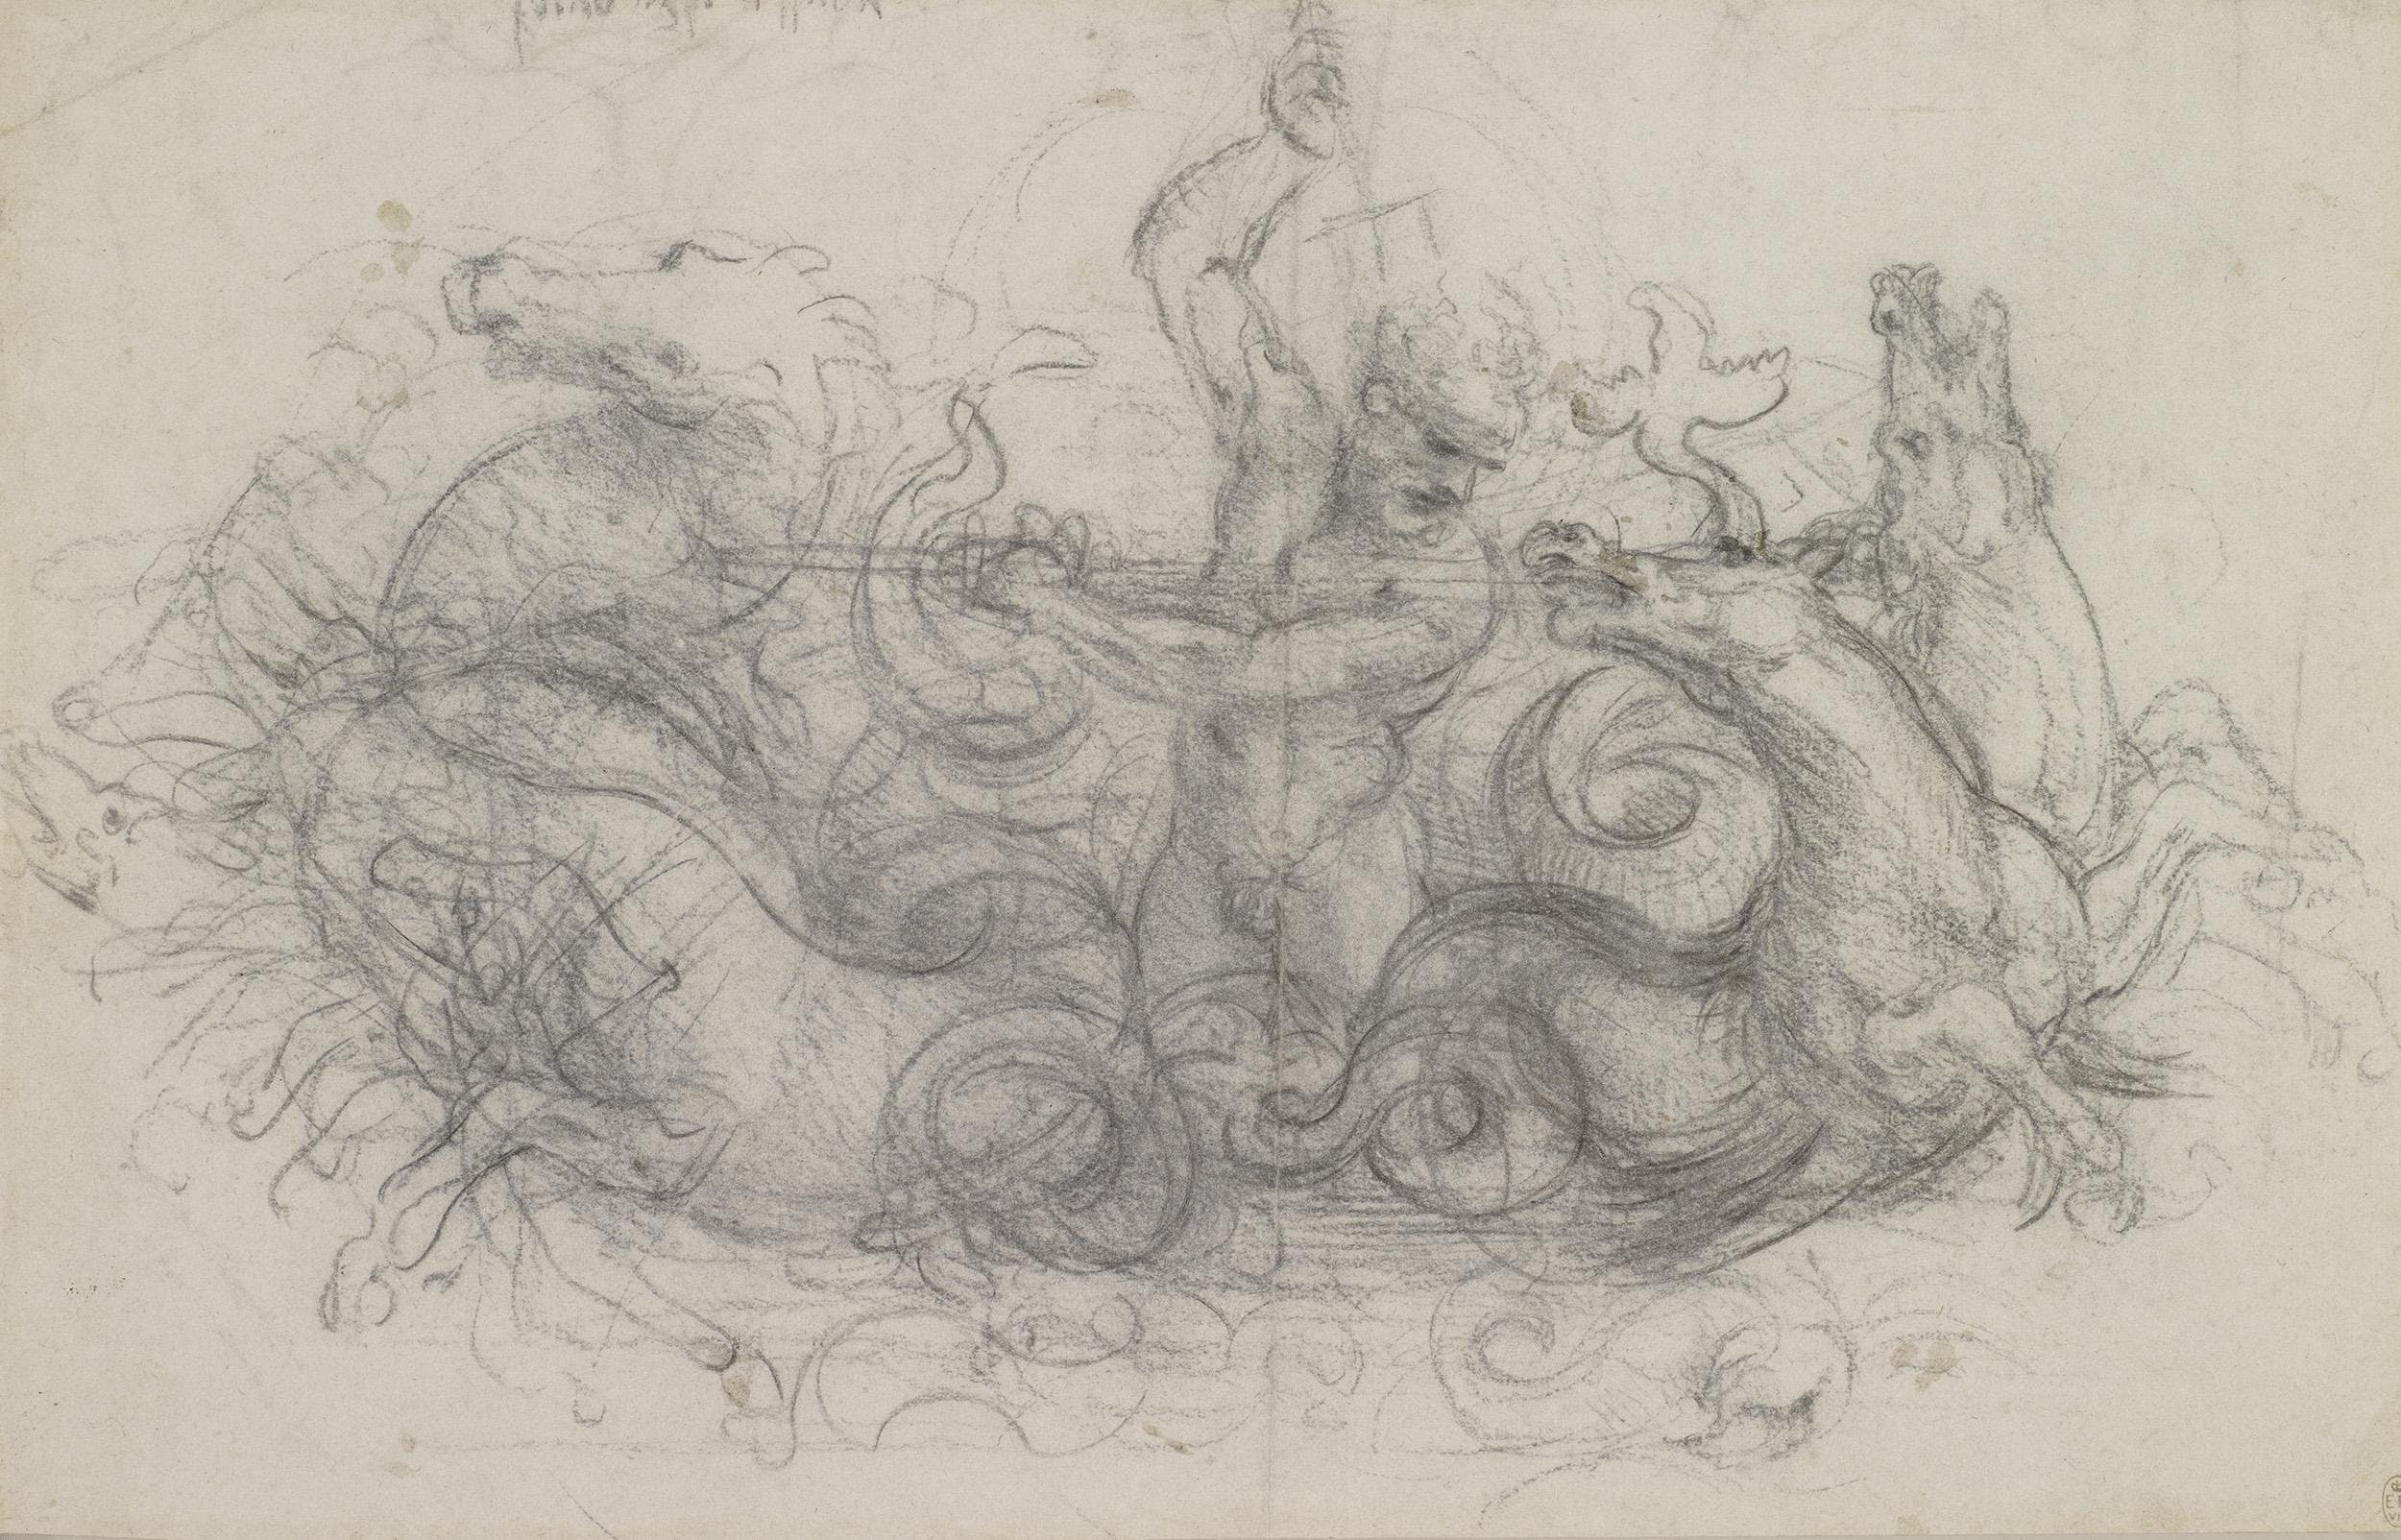 Leonardo da Vinci: A Life in Drawing - Teache